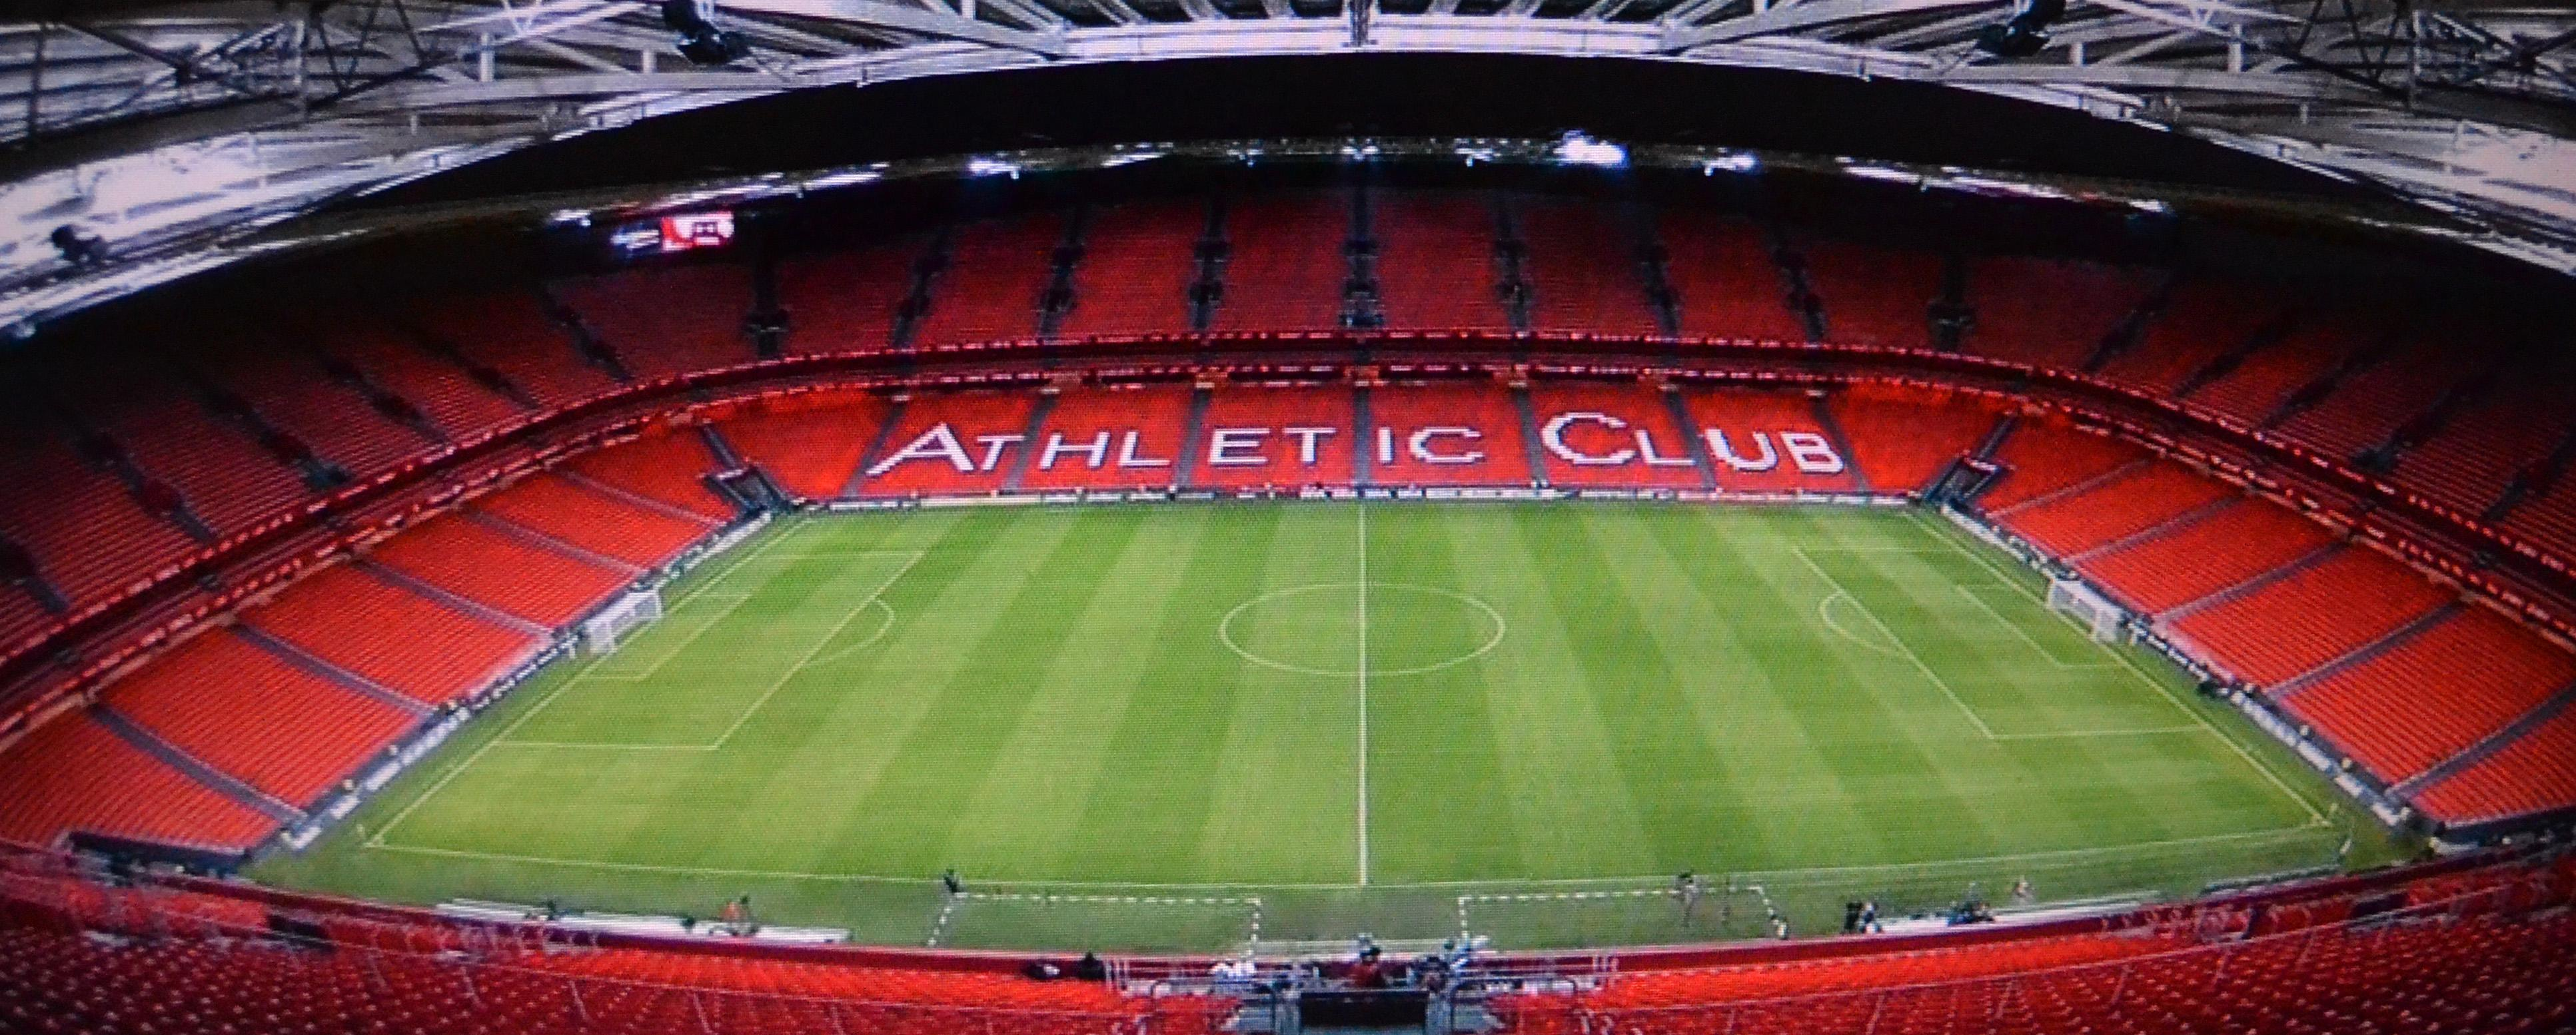 San_Mames,_Athletic_Club._Bilbao,_Bizkaia,_Euskal_Herria.